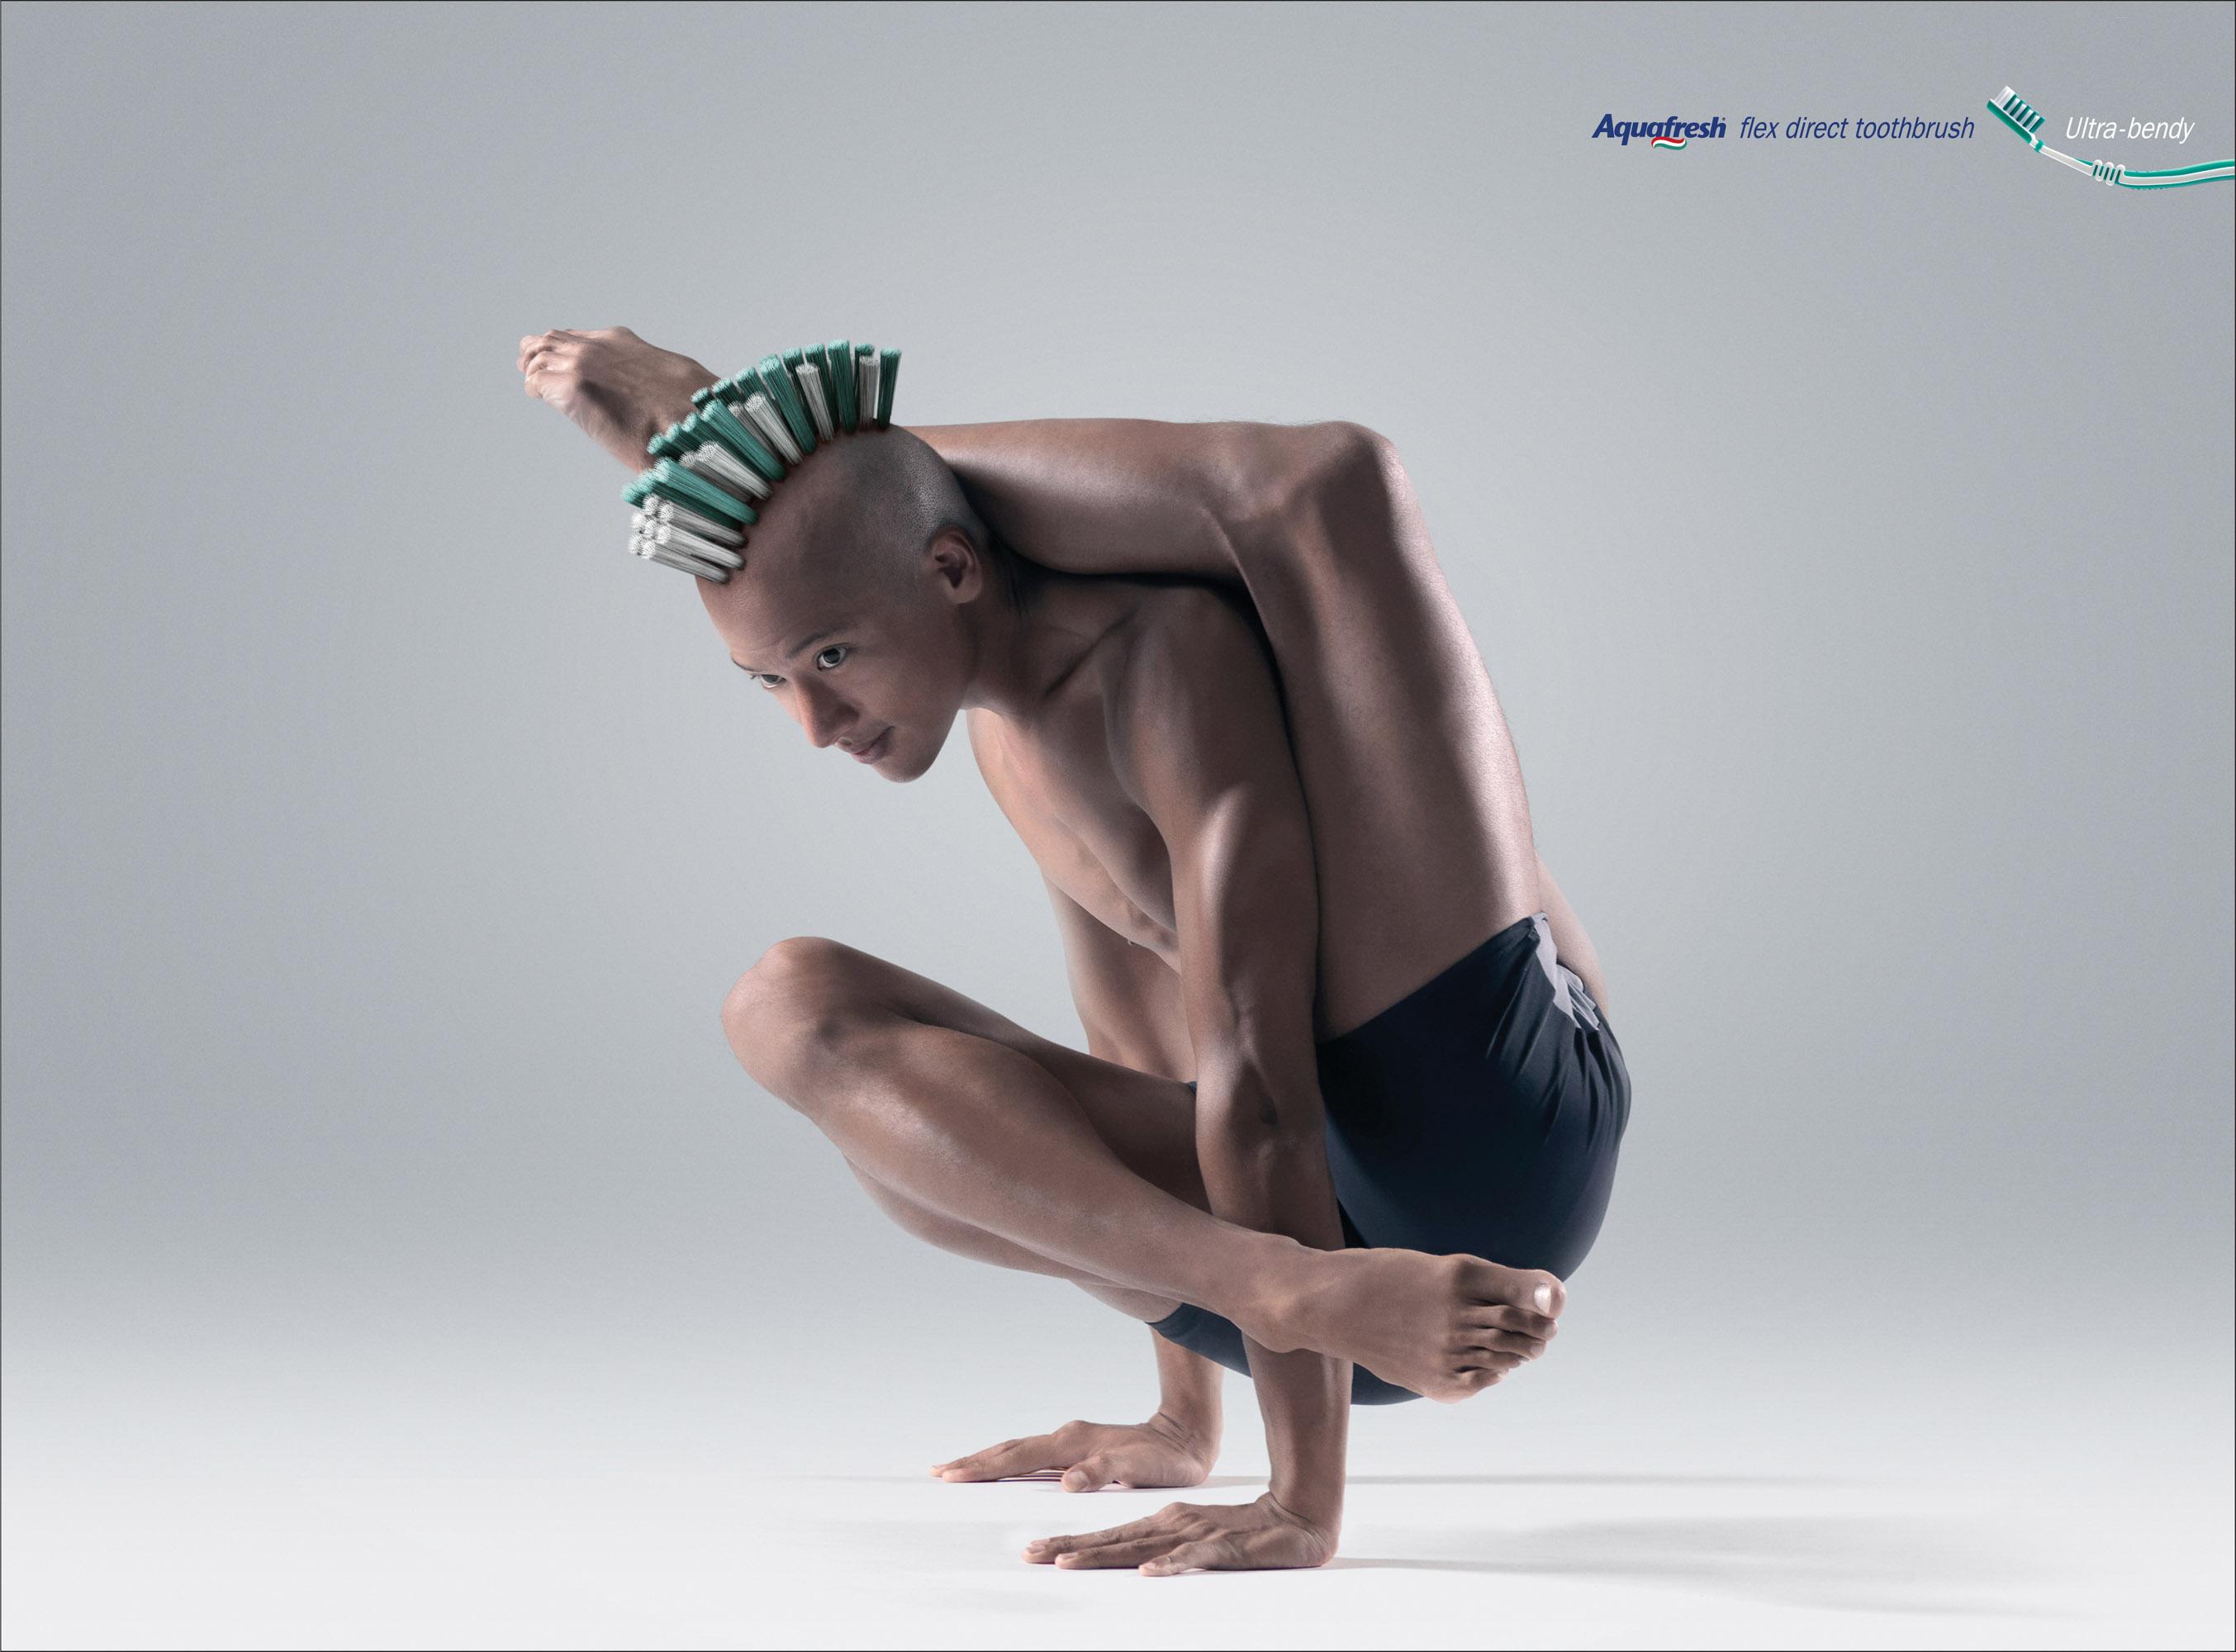 http://www.ibelieveinadv.com/commons/yoga_master_bend.jpg